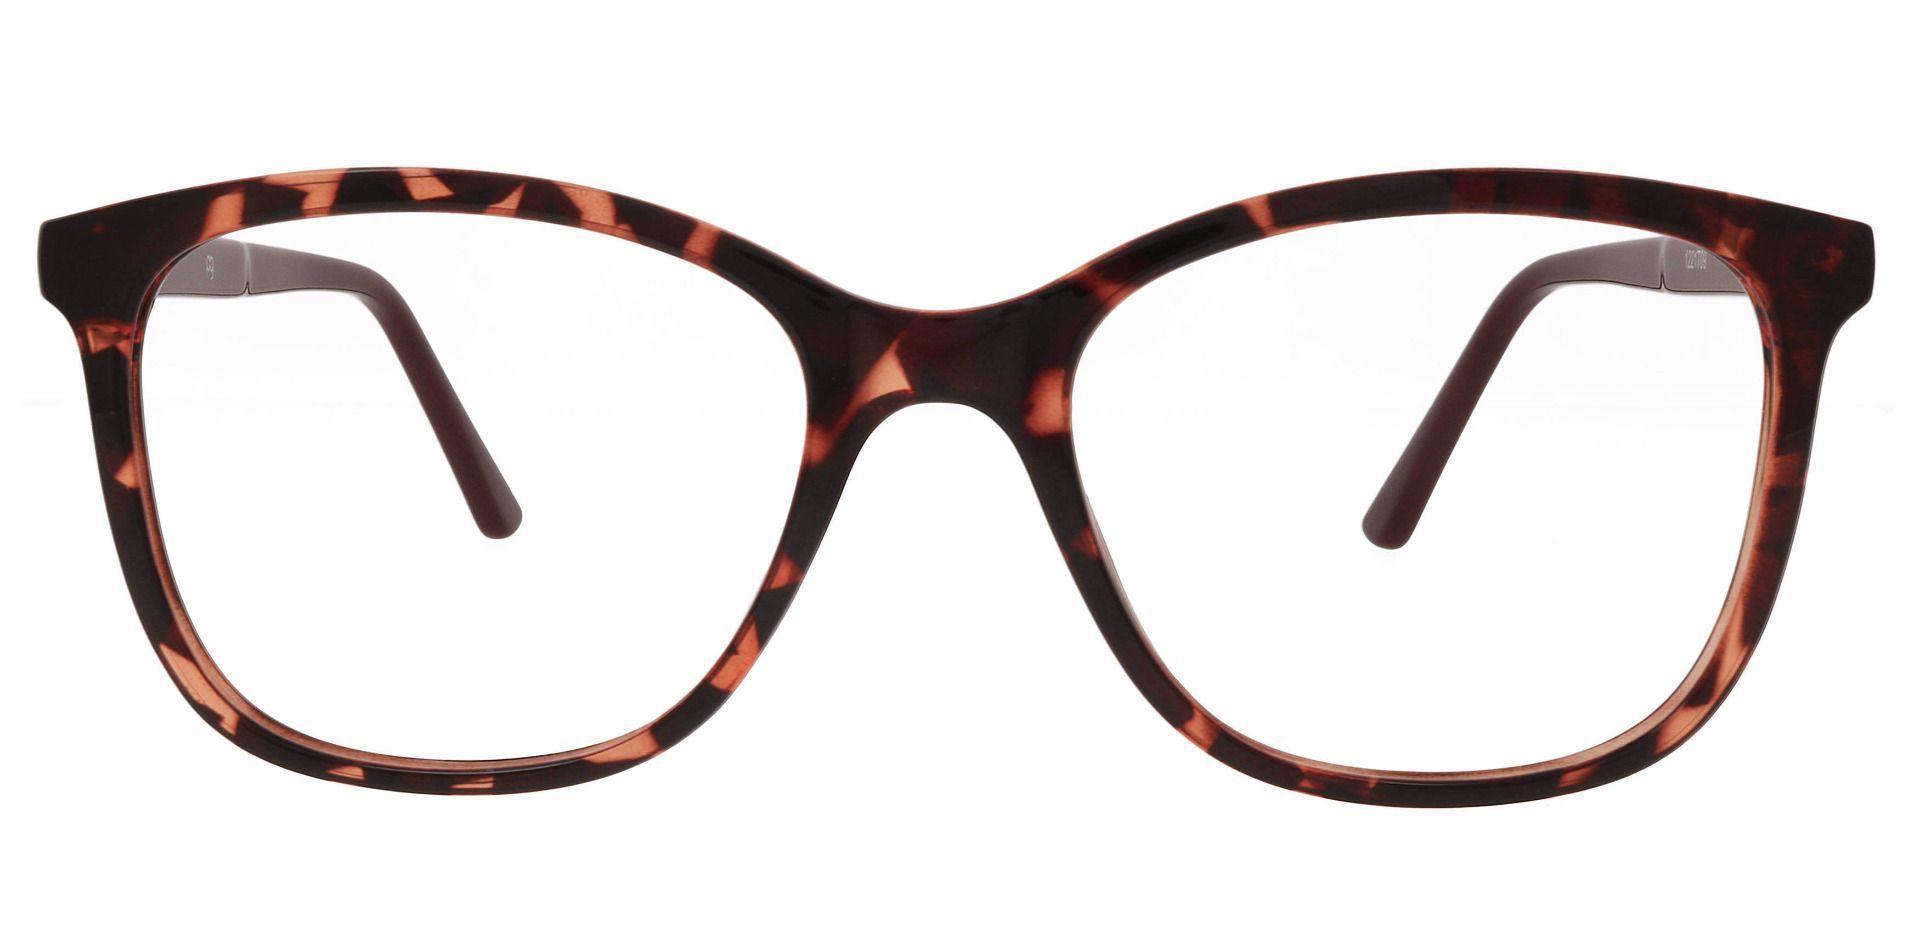 Halpin Square Prescription Glasses - Tortoise